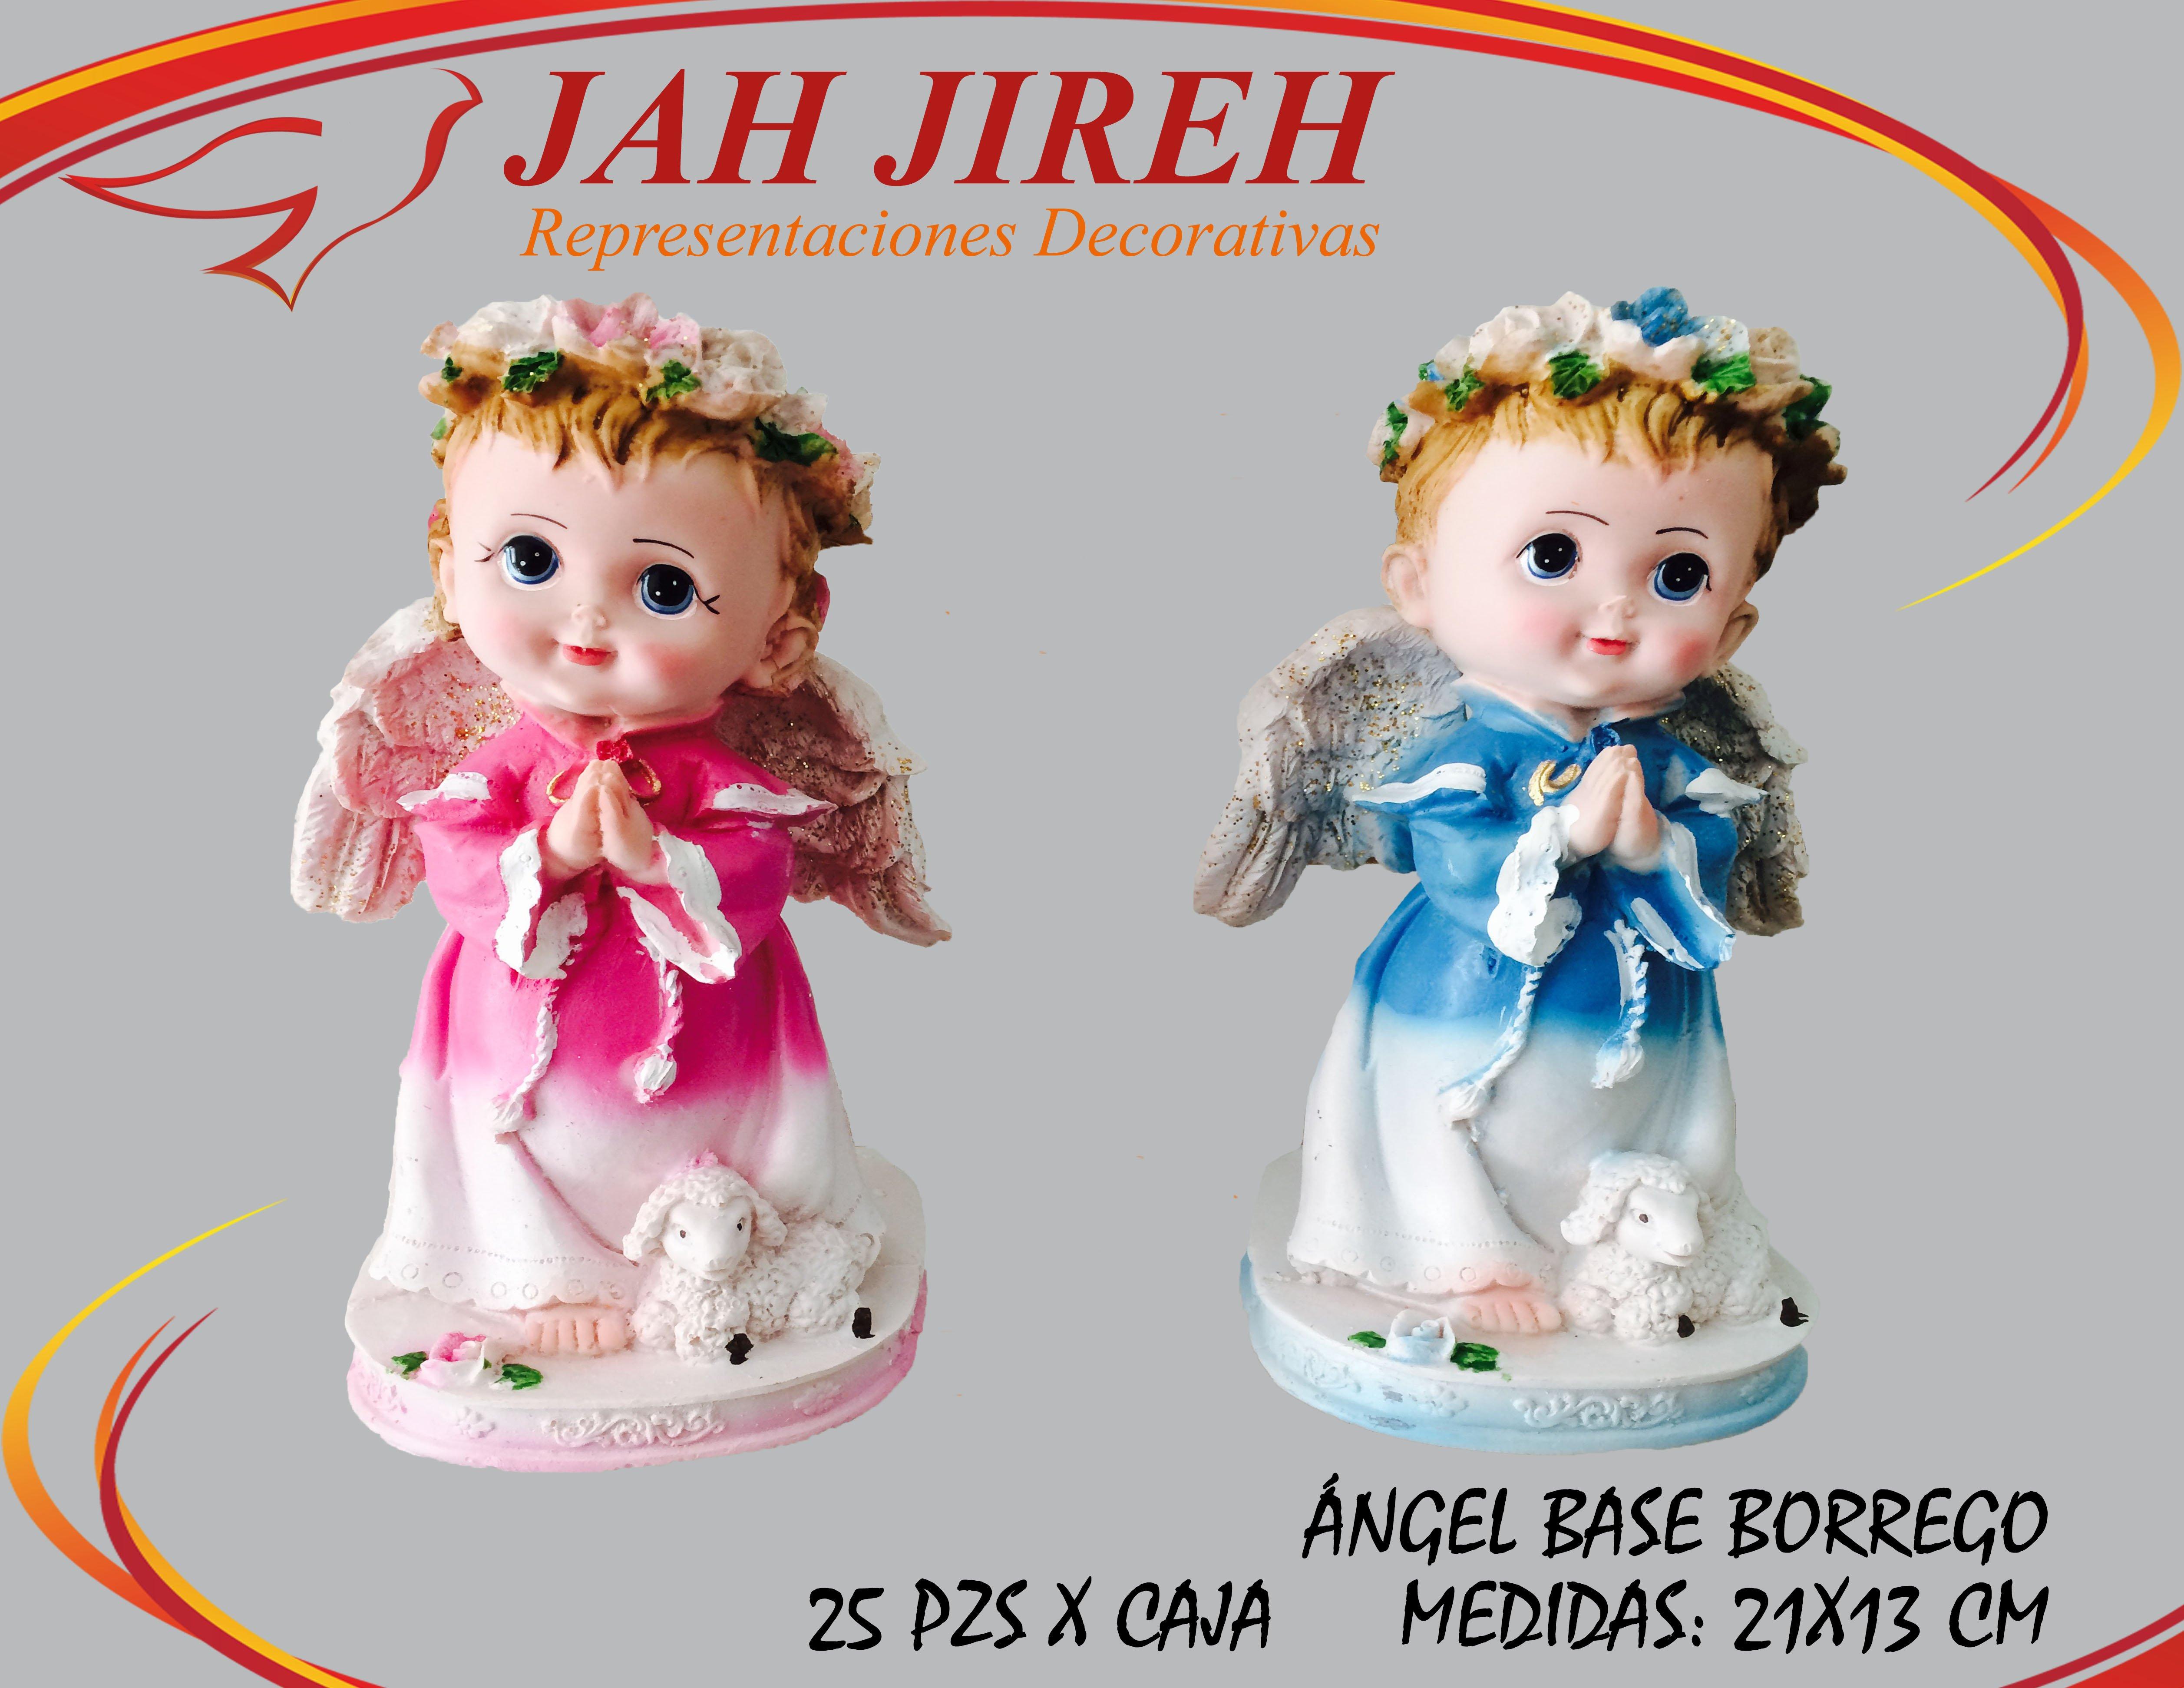 https://0201.nccdn.net/4_2/000/000/06b/a1b/angel-base-borrego.jpg